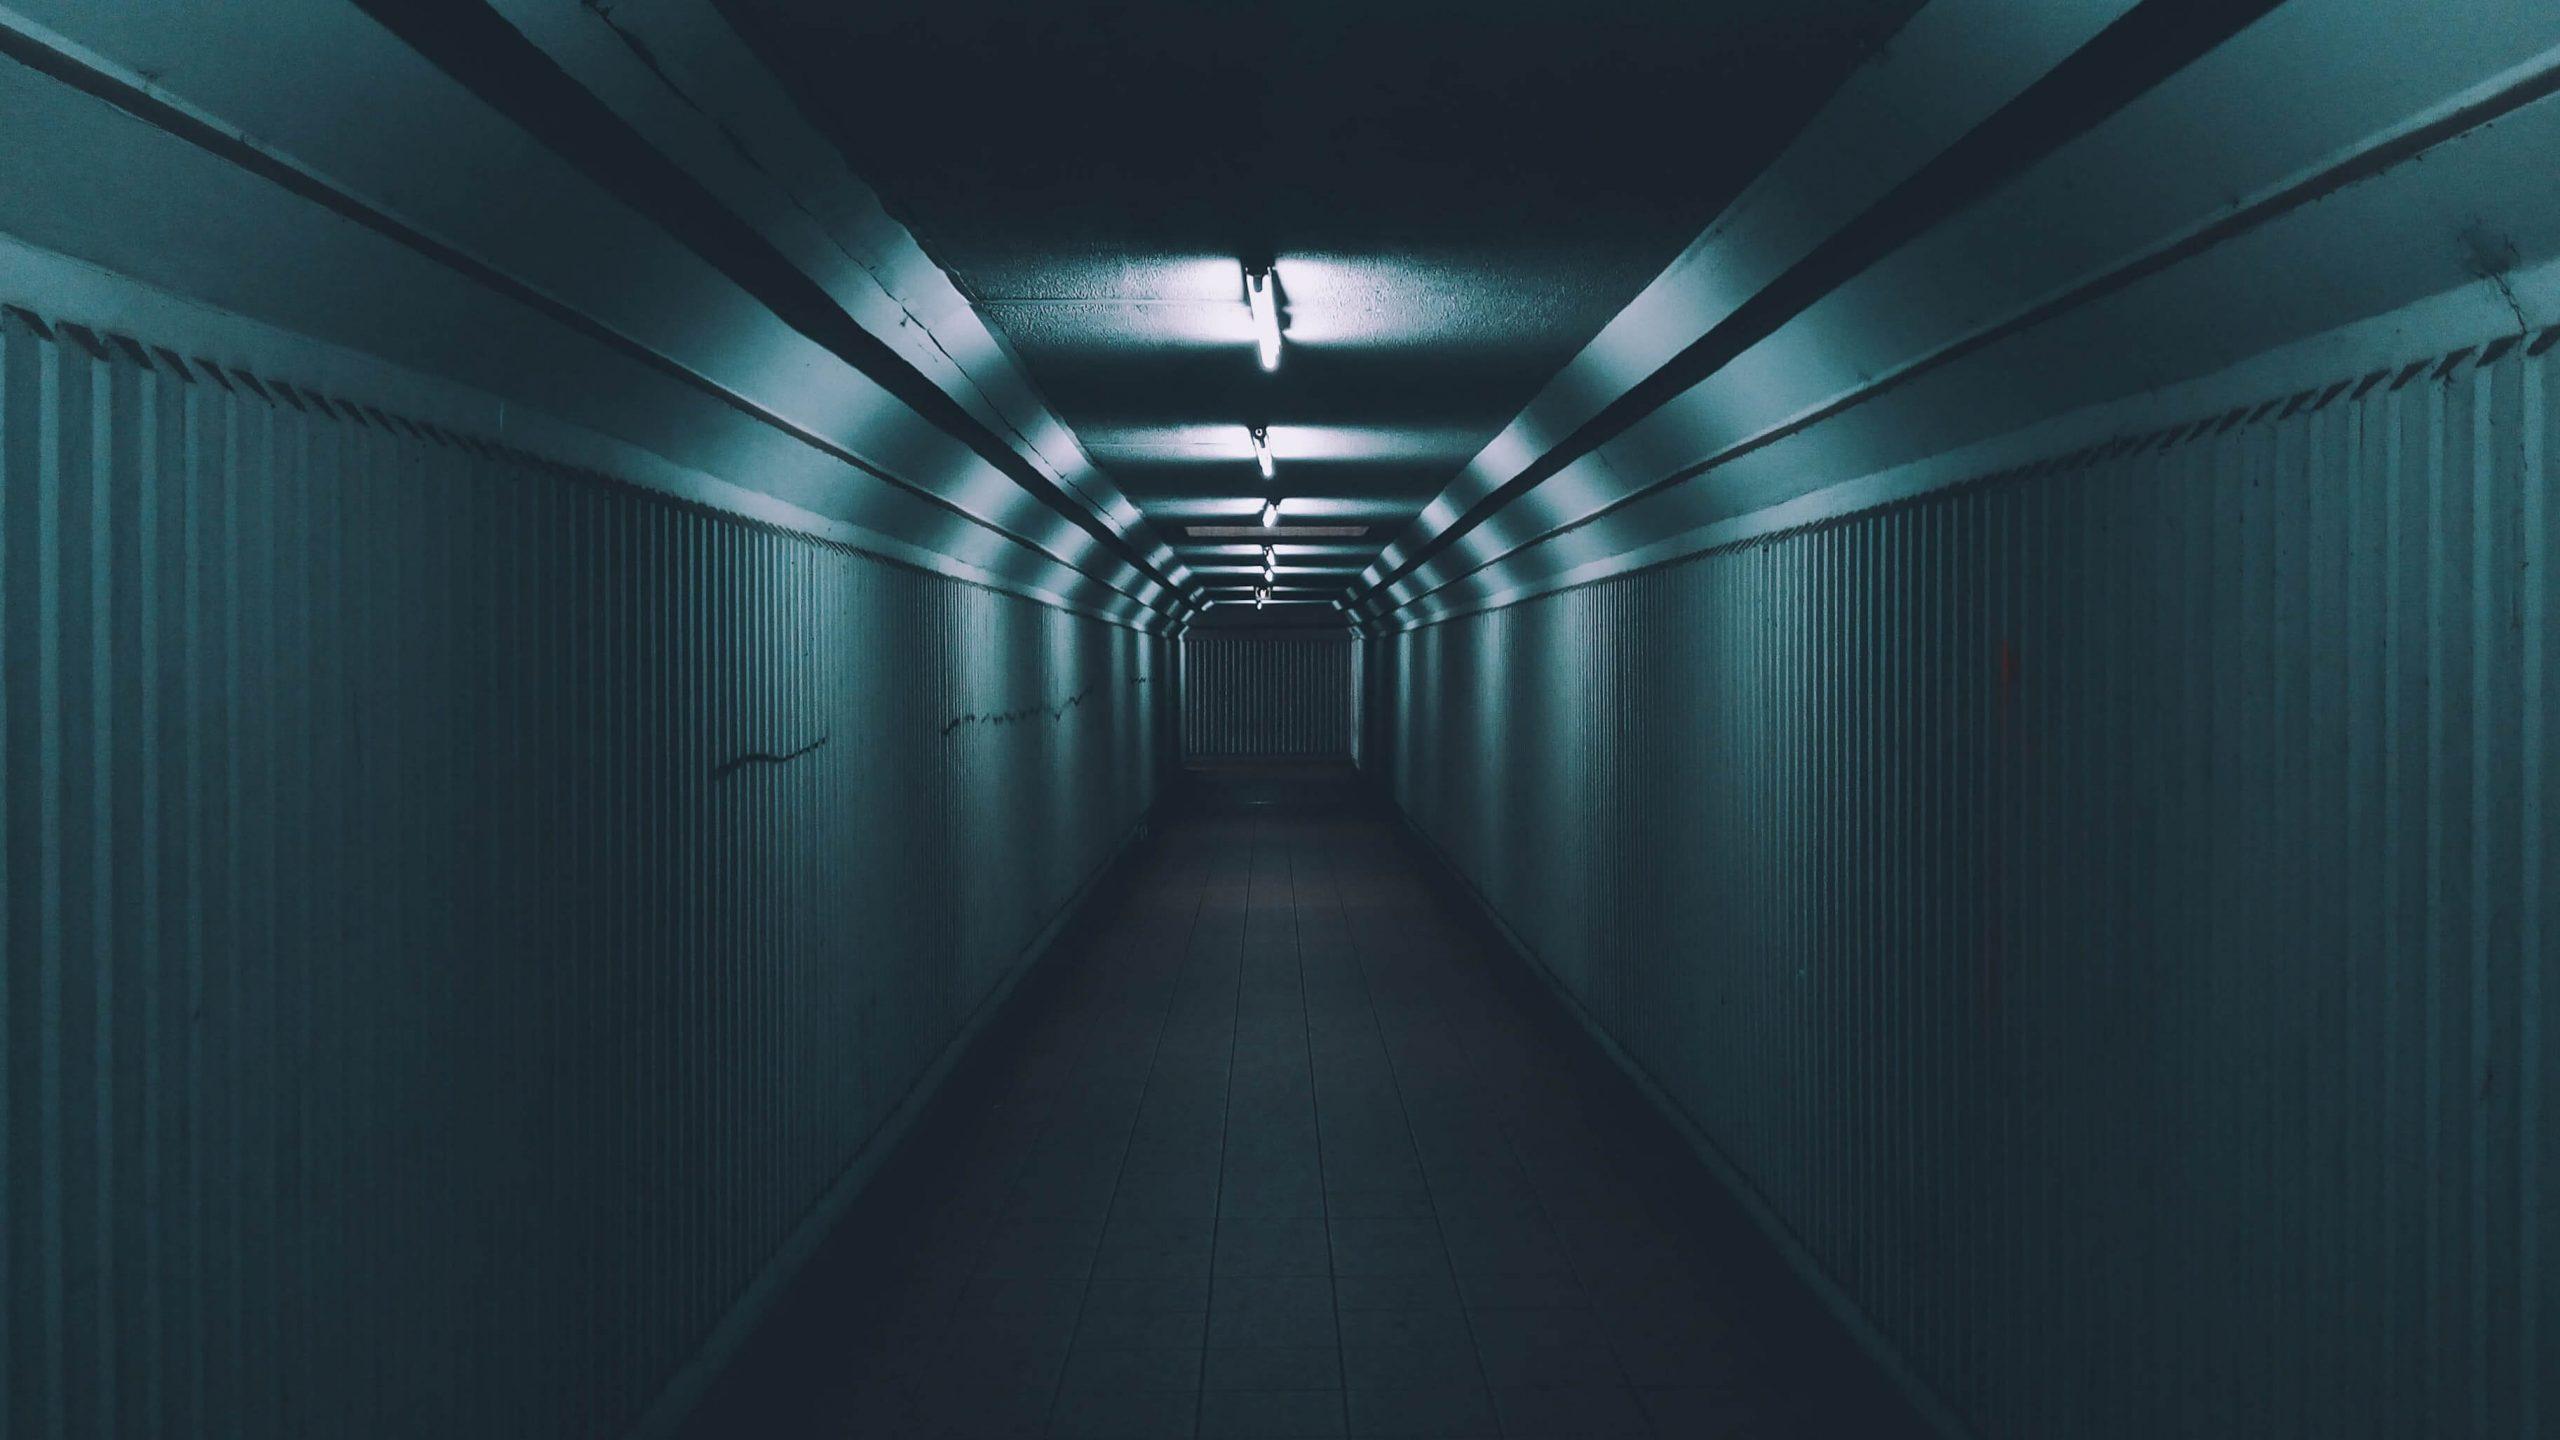 What Makes a Good Escape Room?